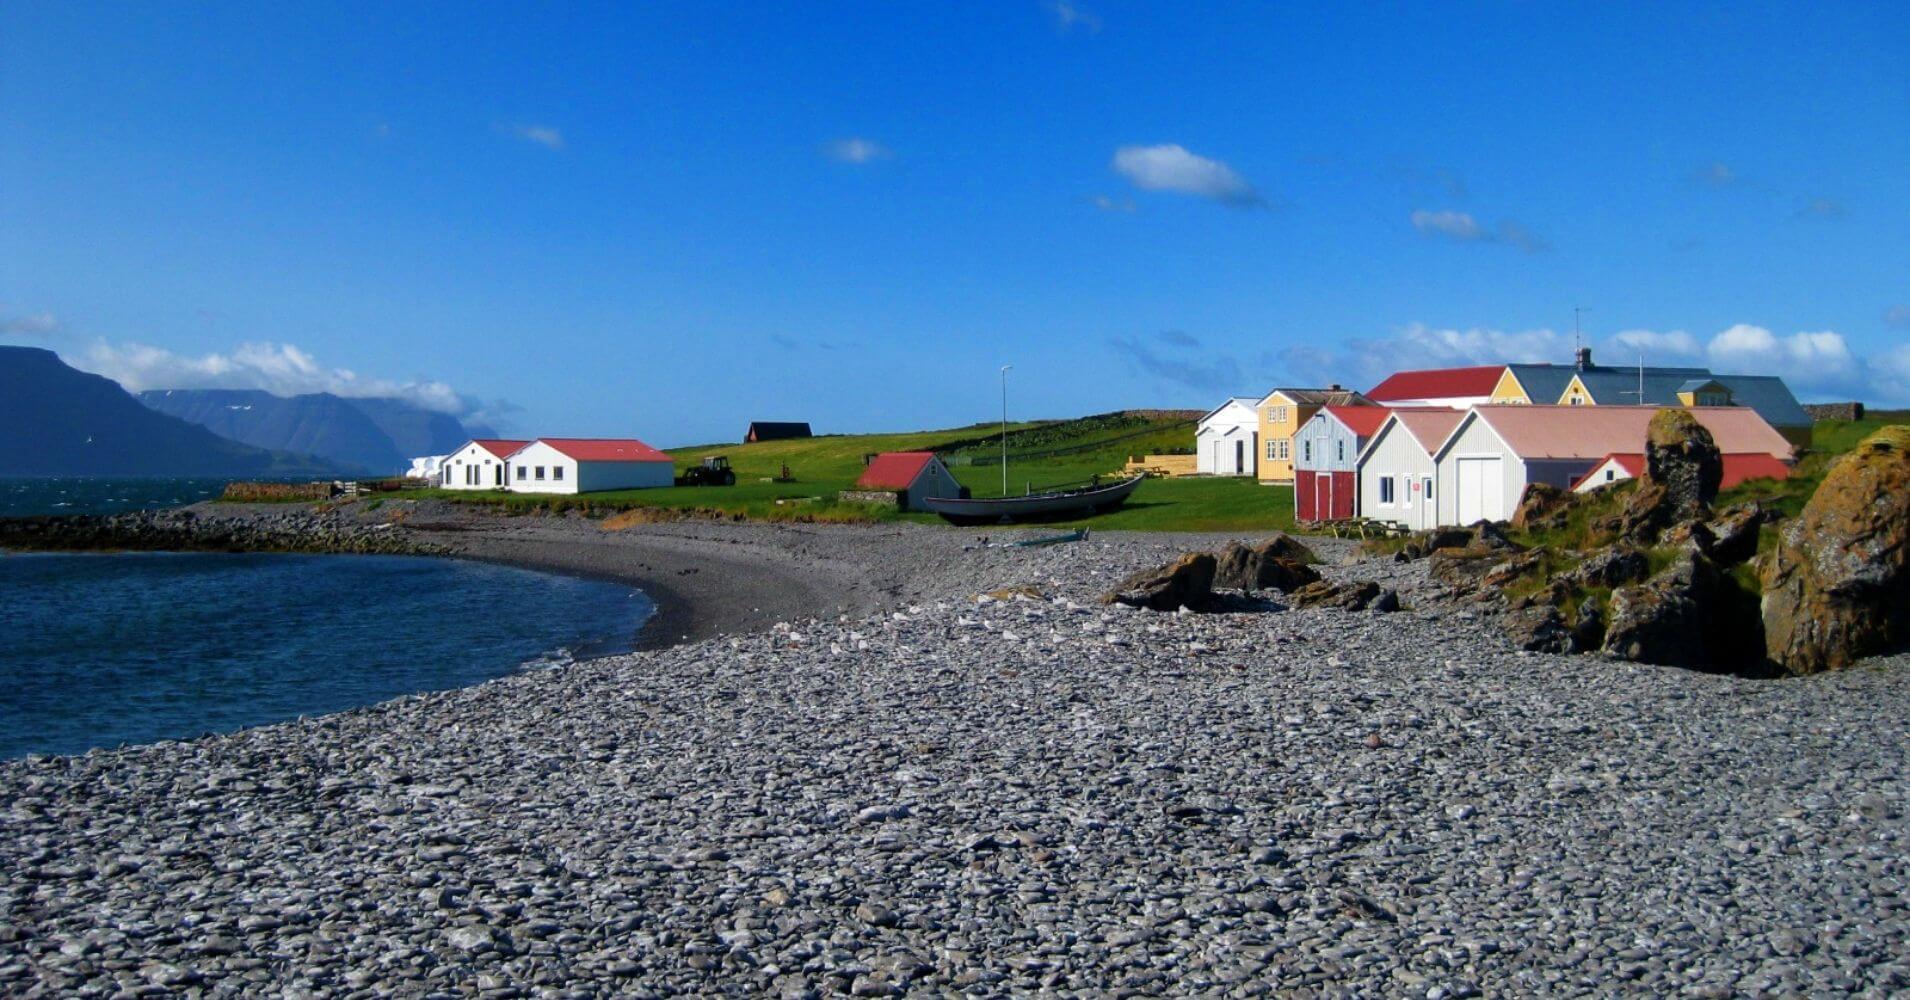 Granja de Isla Vigur. Ísafjörður. Vestfirðir. Islandia.